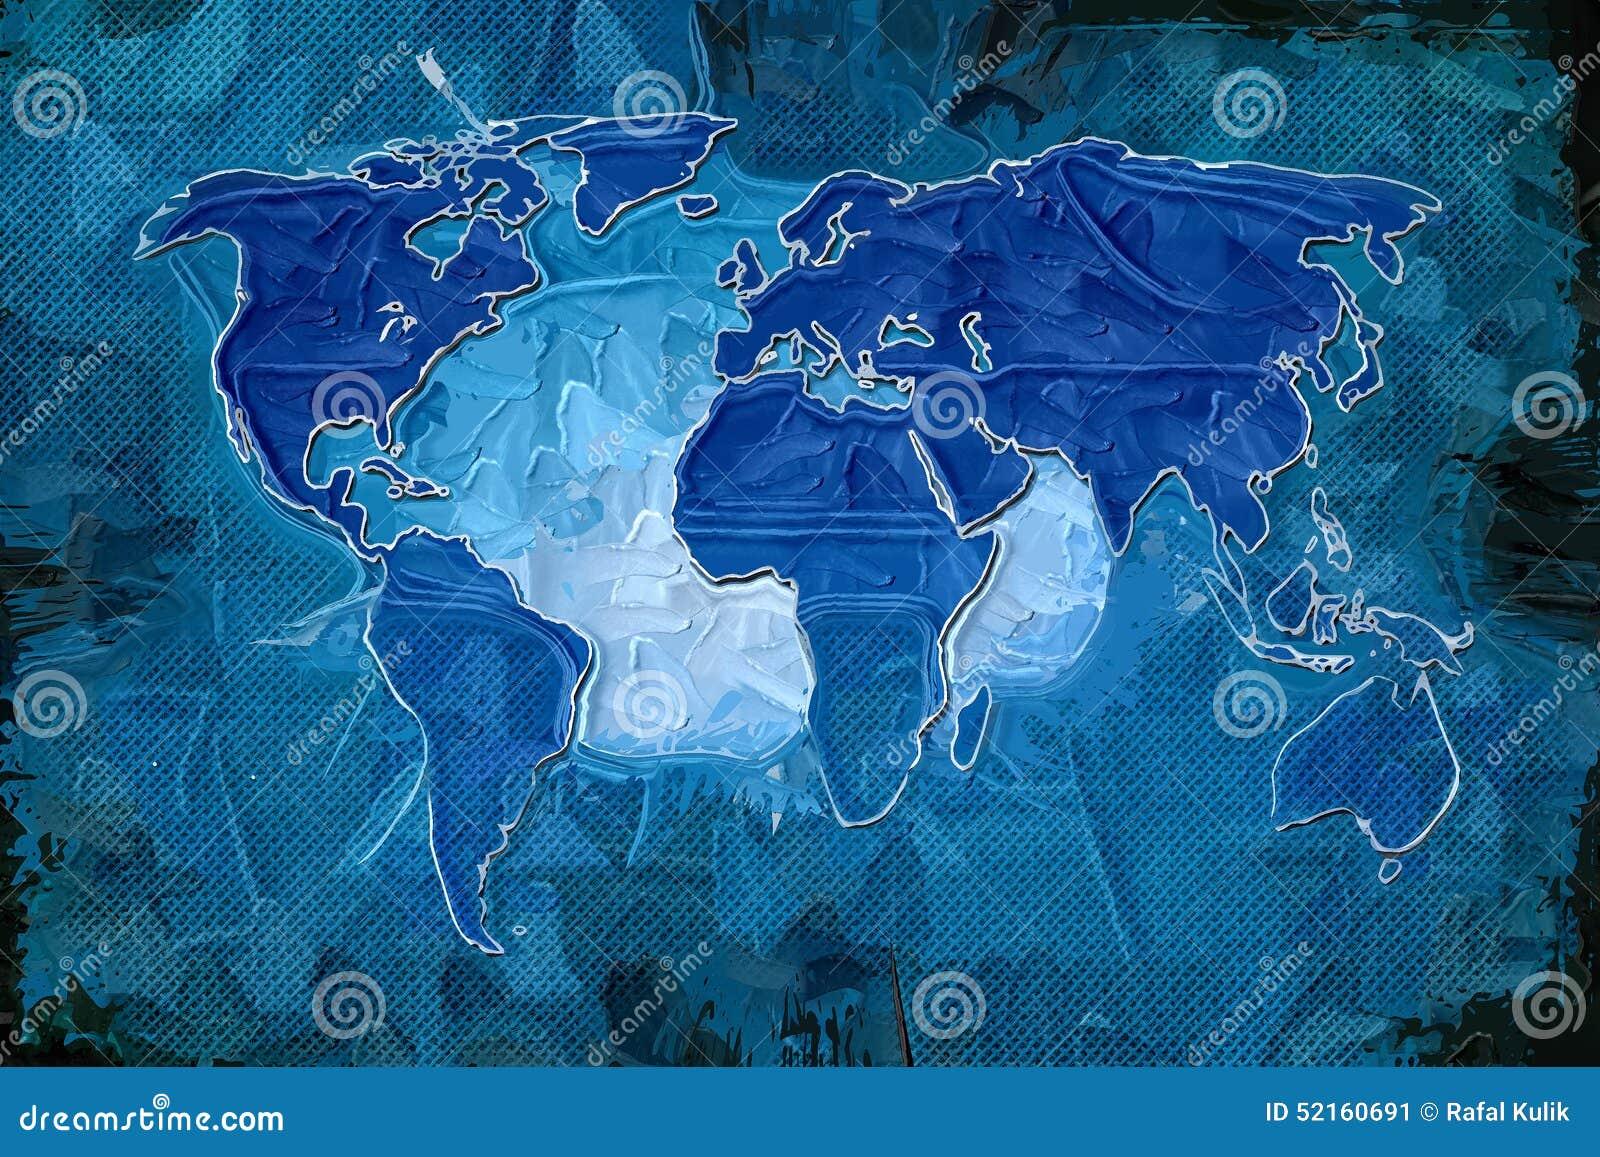 World map paint design art stock illustration illustration of drawn download world map paint design art stock illustration illustration of drawn 52160691 gumiabroncs Images